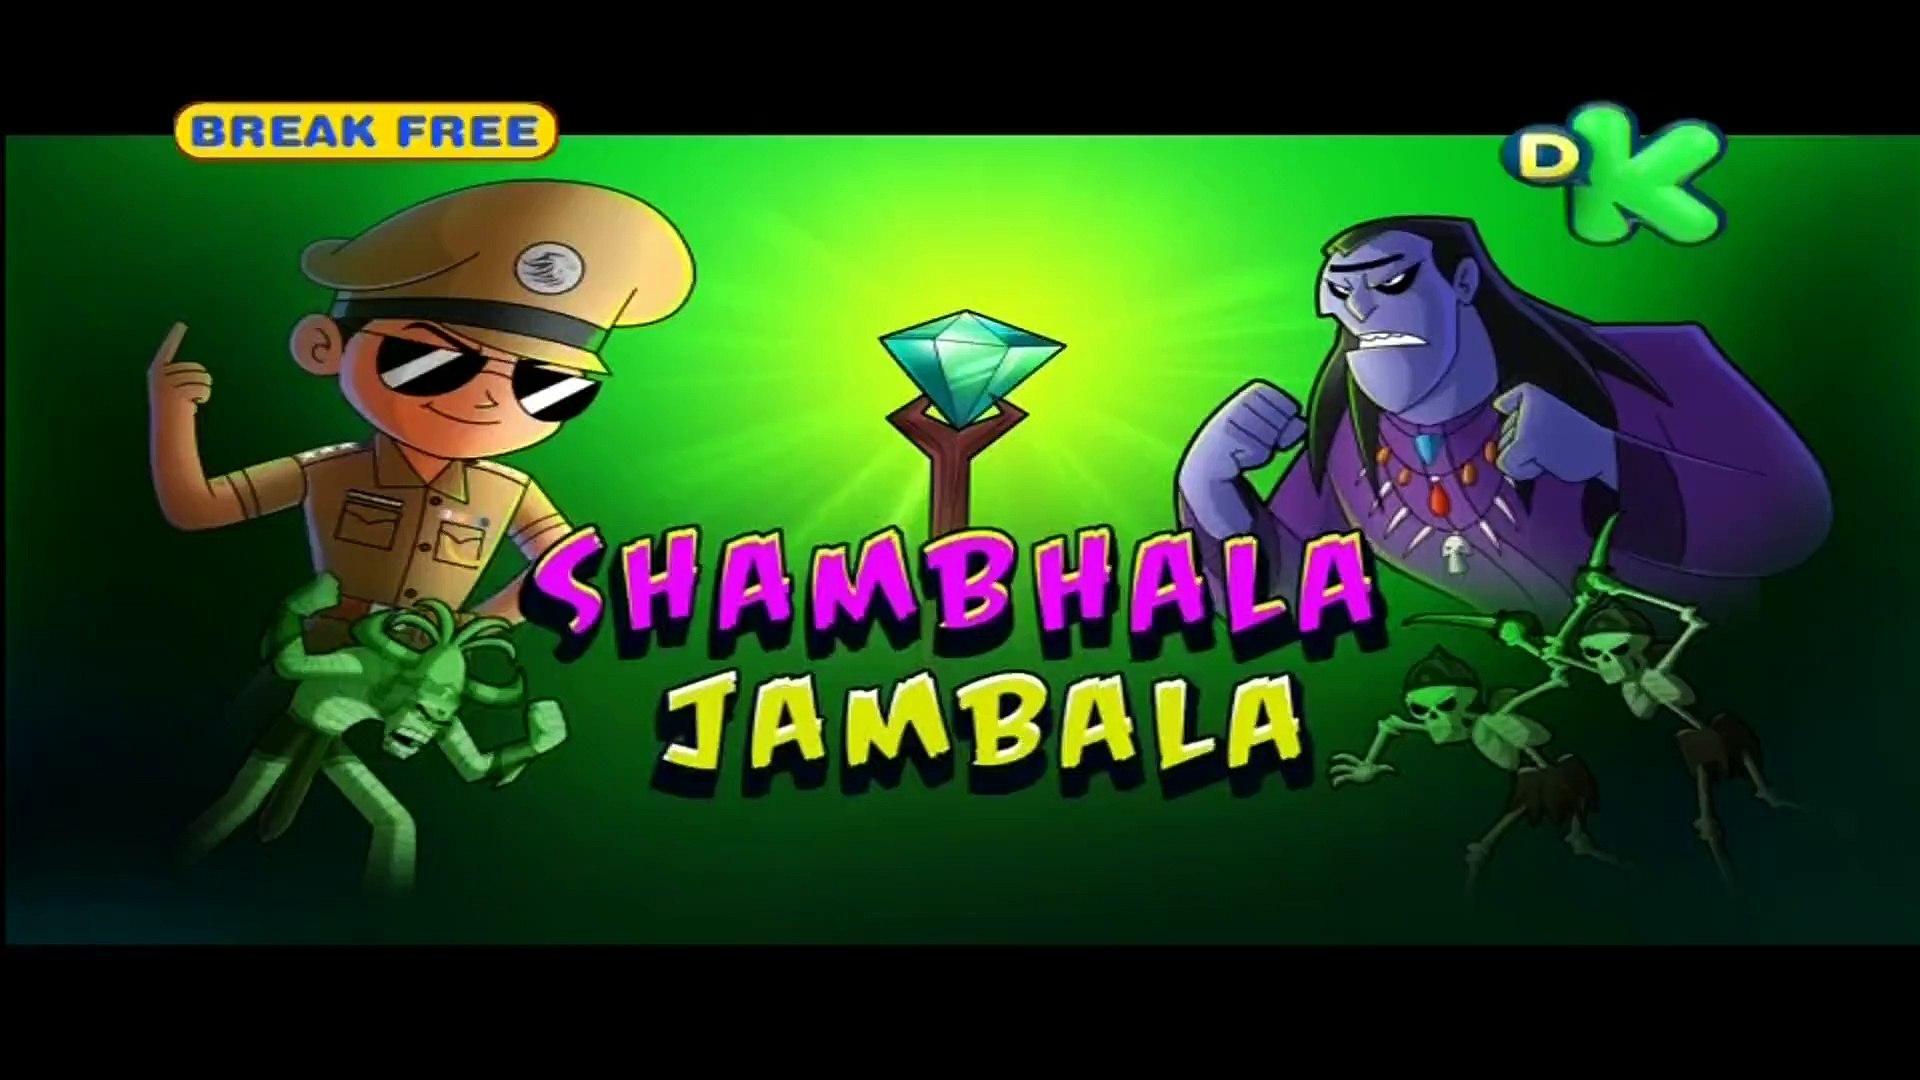 Shambhala Jambala - Little Singham - In HINDI - Animated Cartoon For Kids